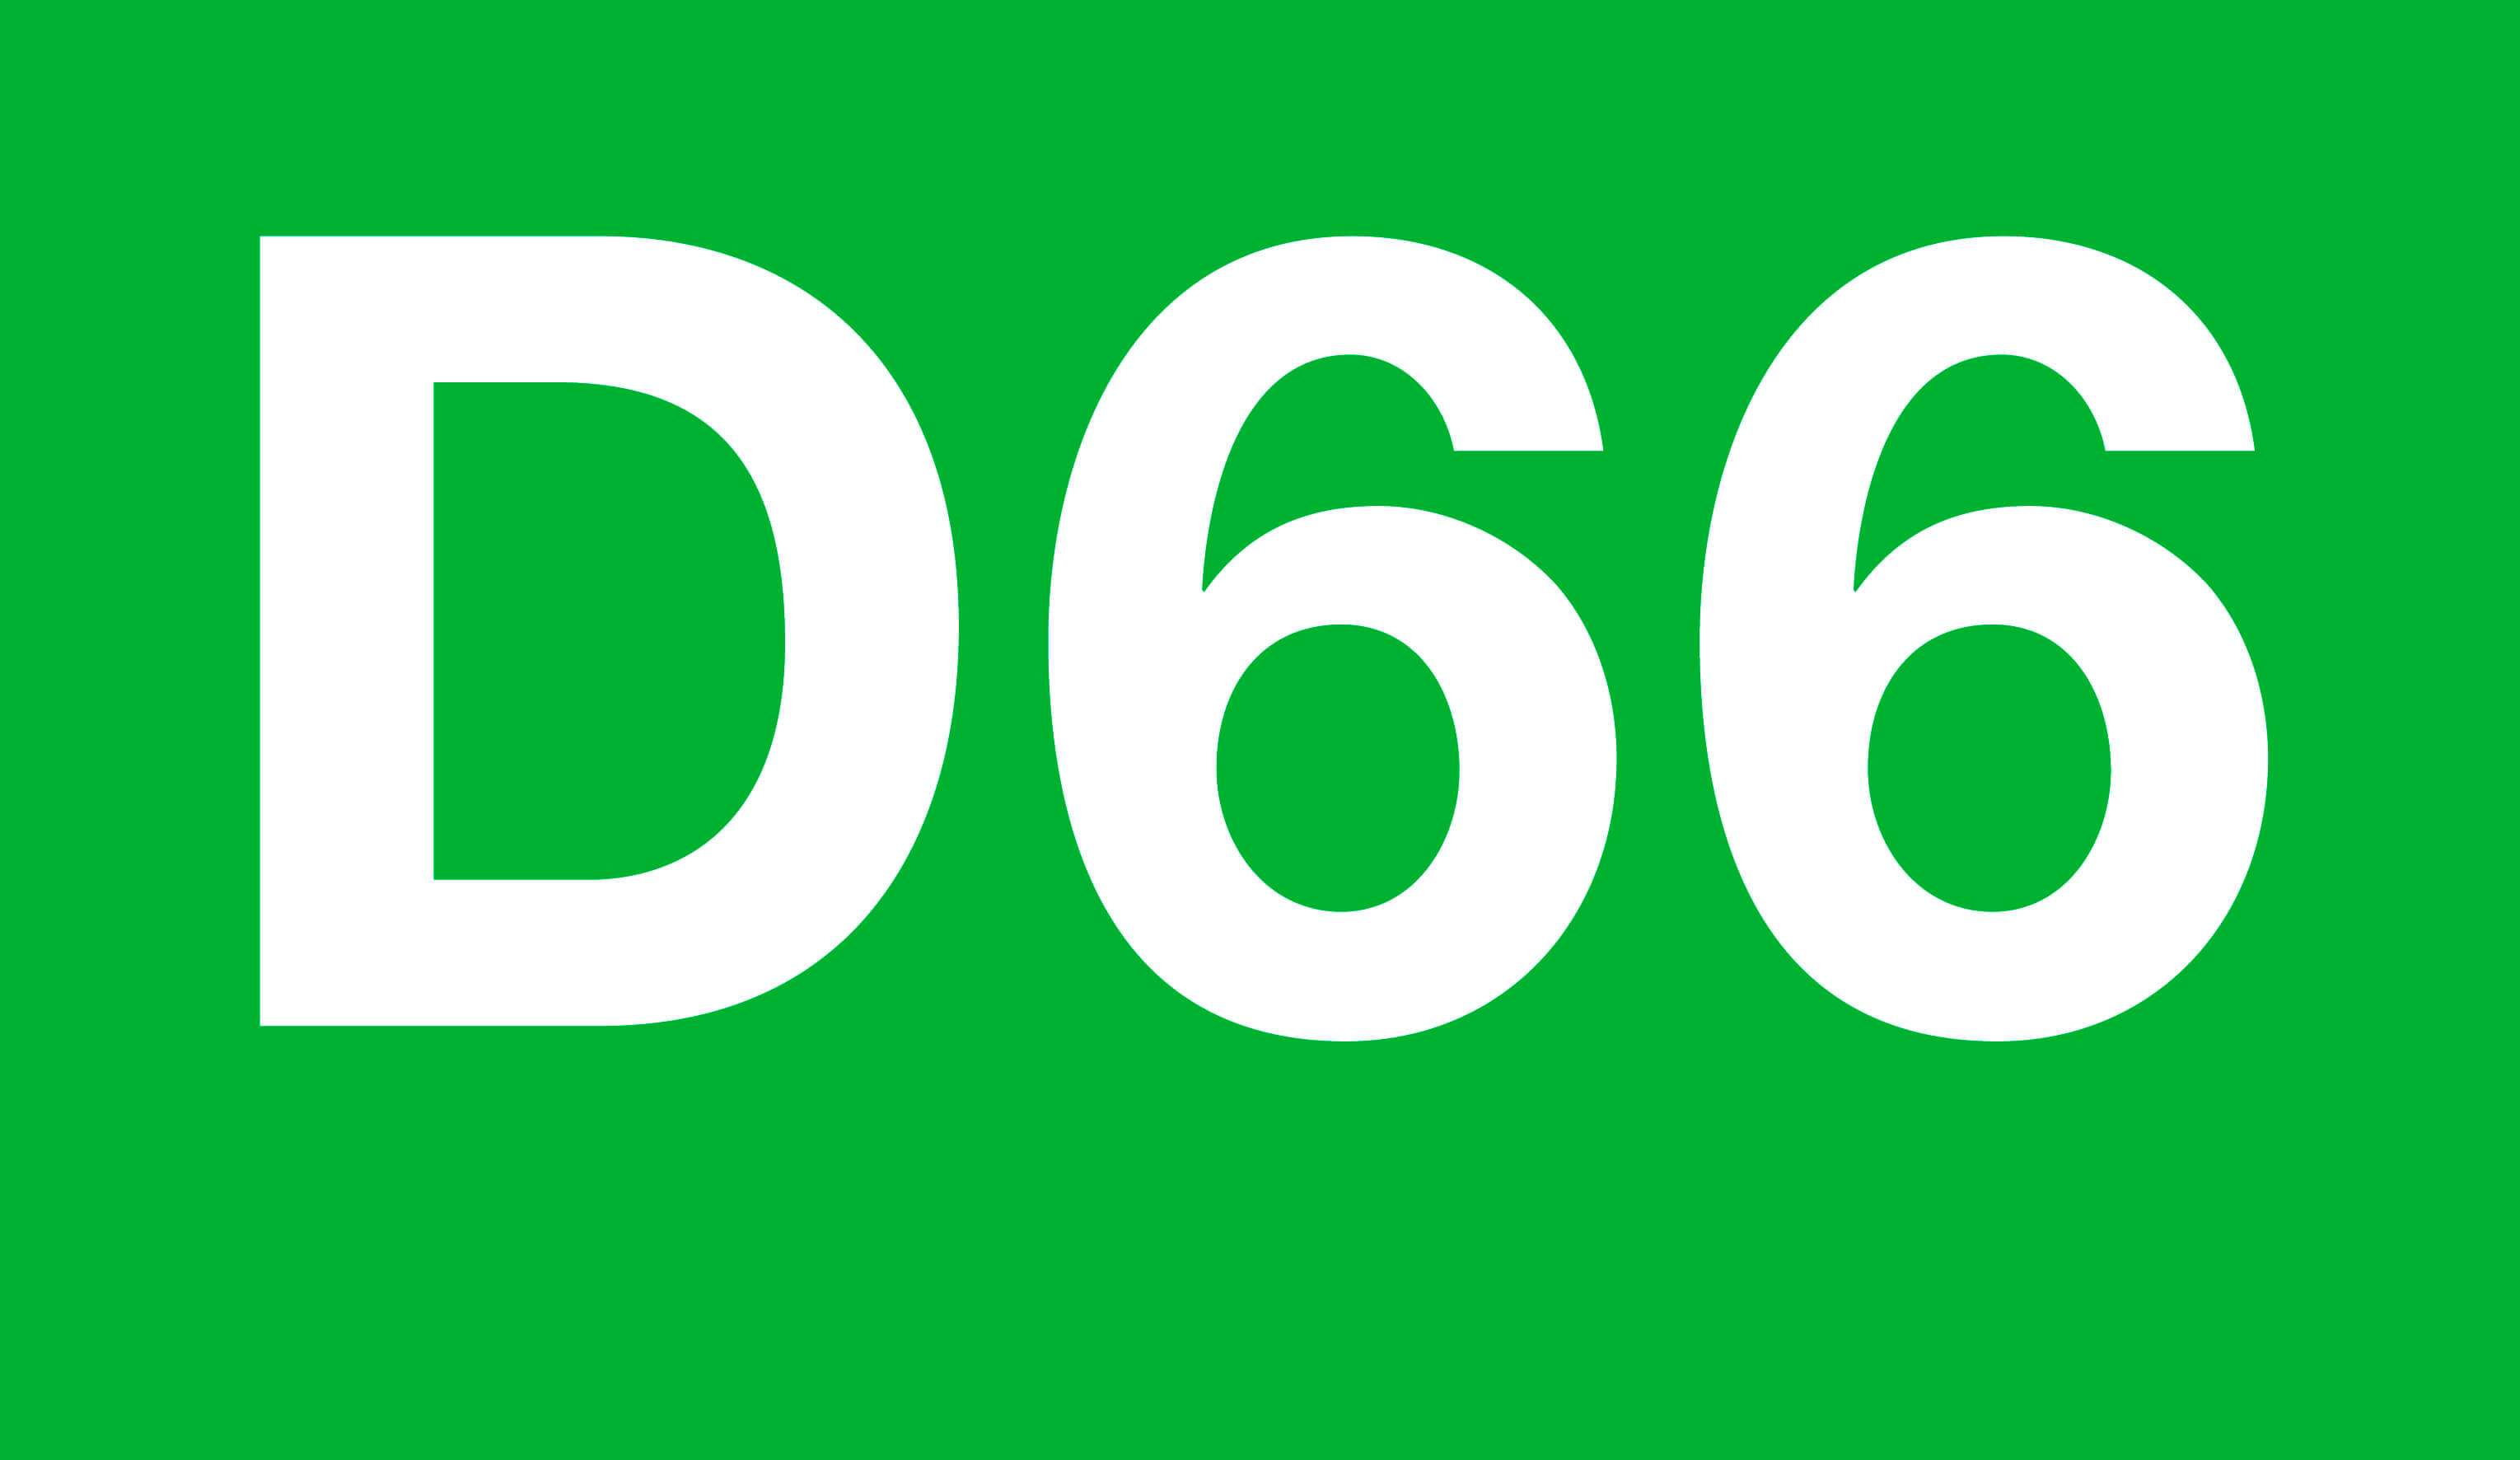 D66 Ommen